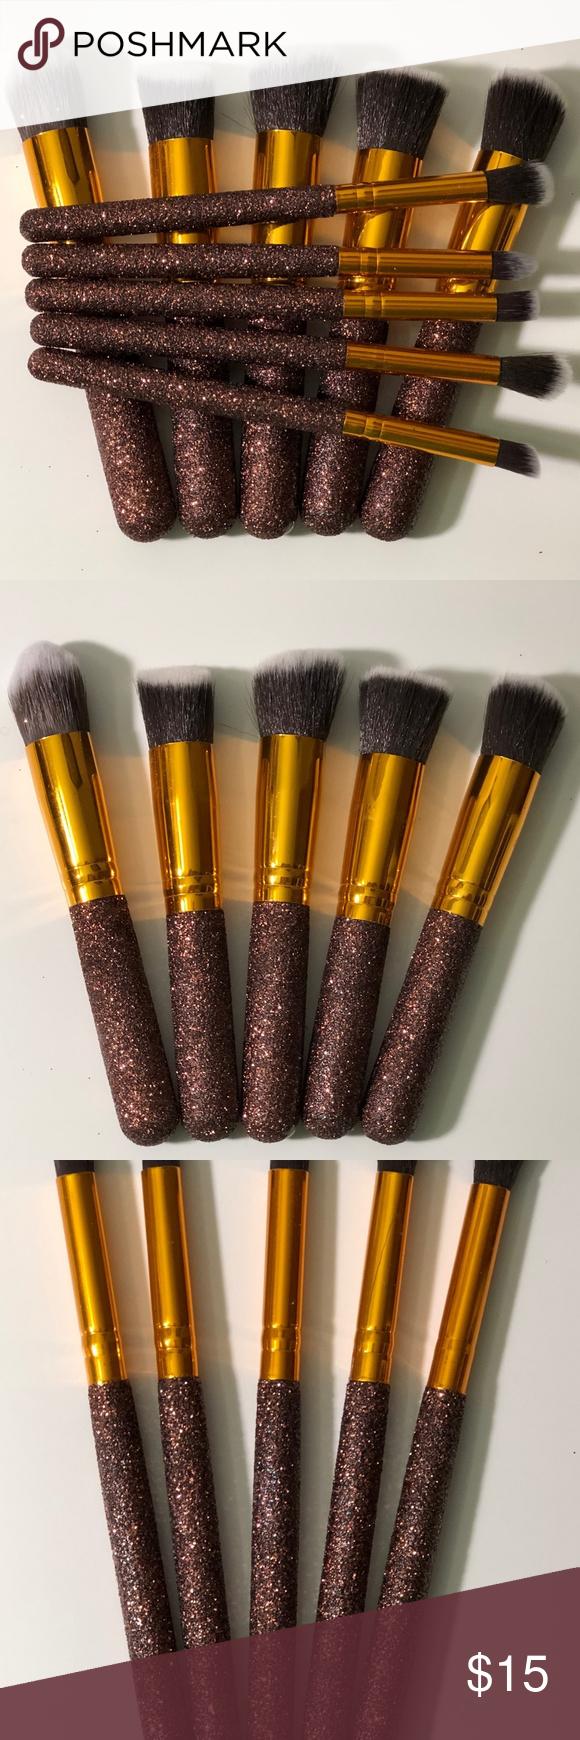 Photo of 10-teiliges, individuelles Glitzer-Make-up-Pinsel-Set